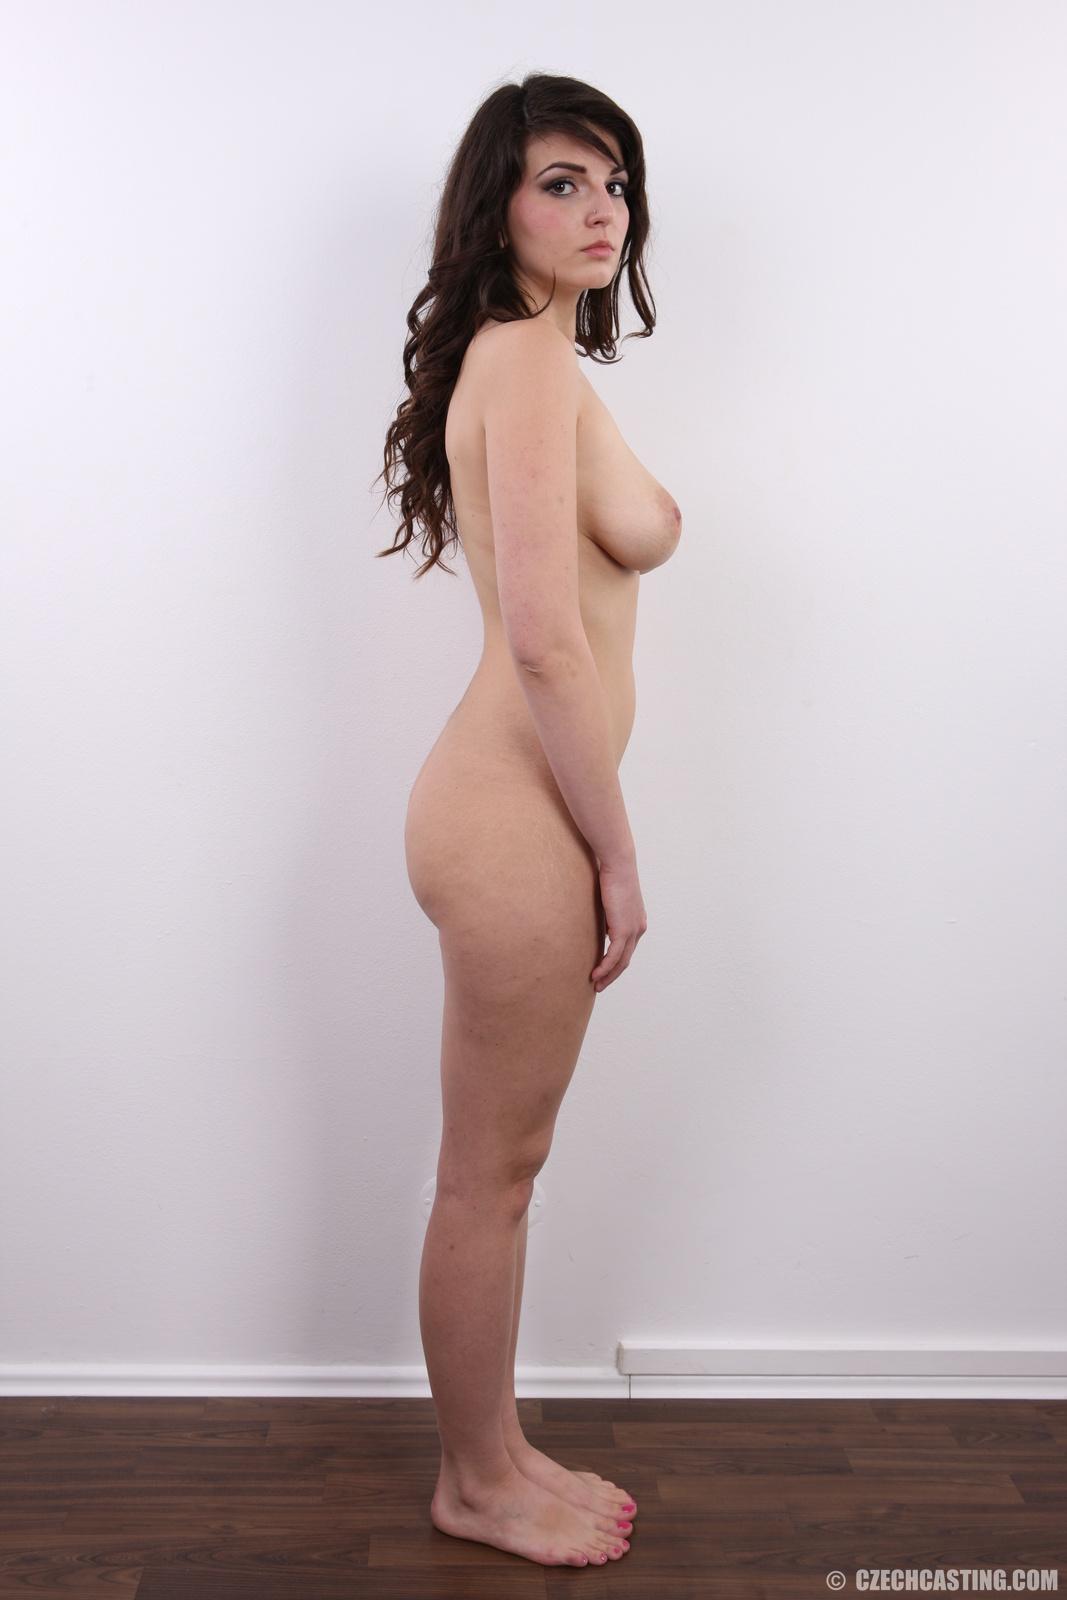 cara zavaleta nude sex pics